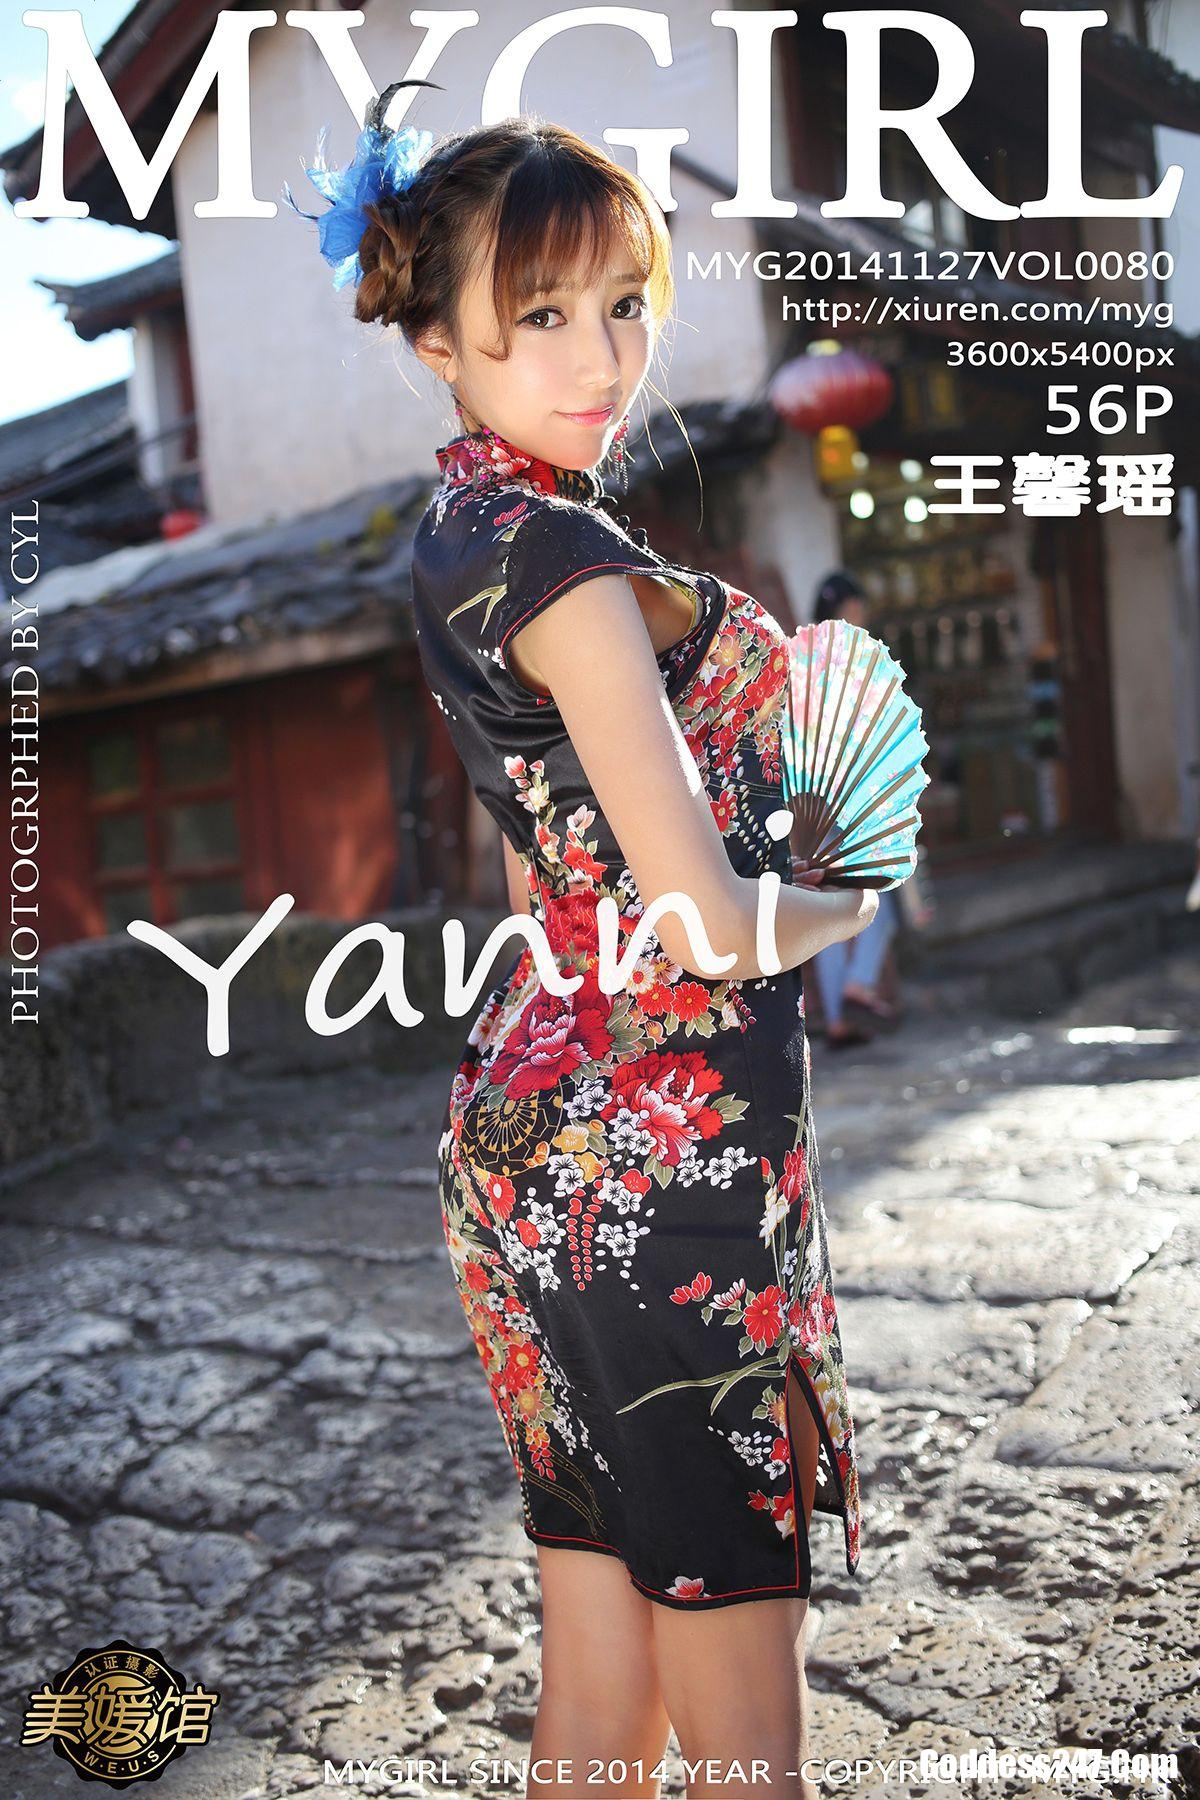 MyGirl Vol.080 王馨瑶yanni